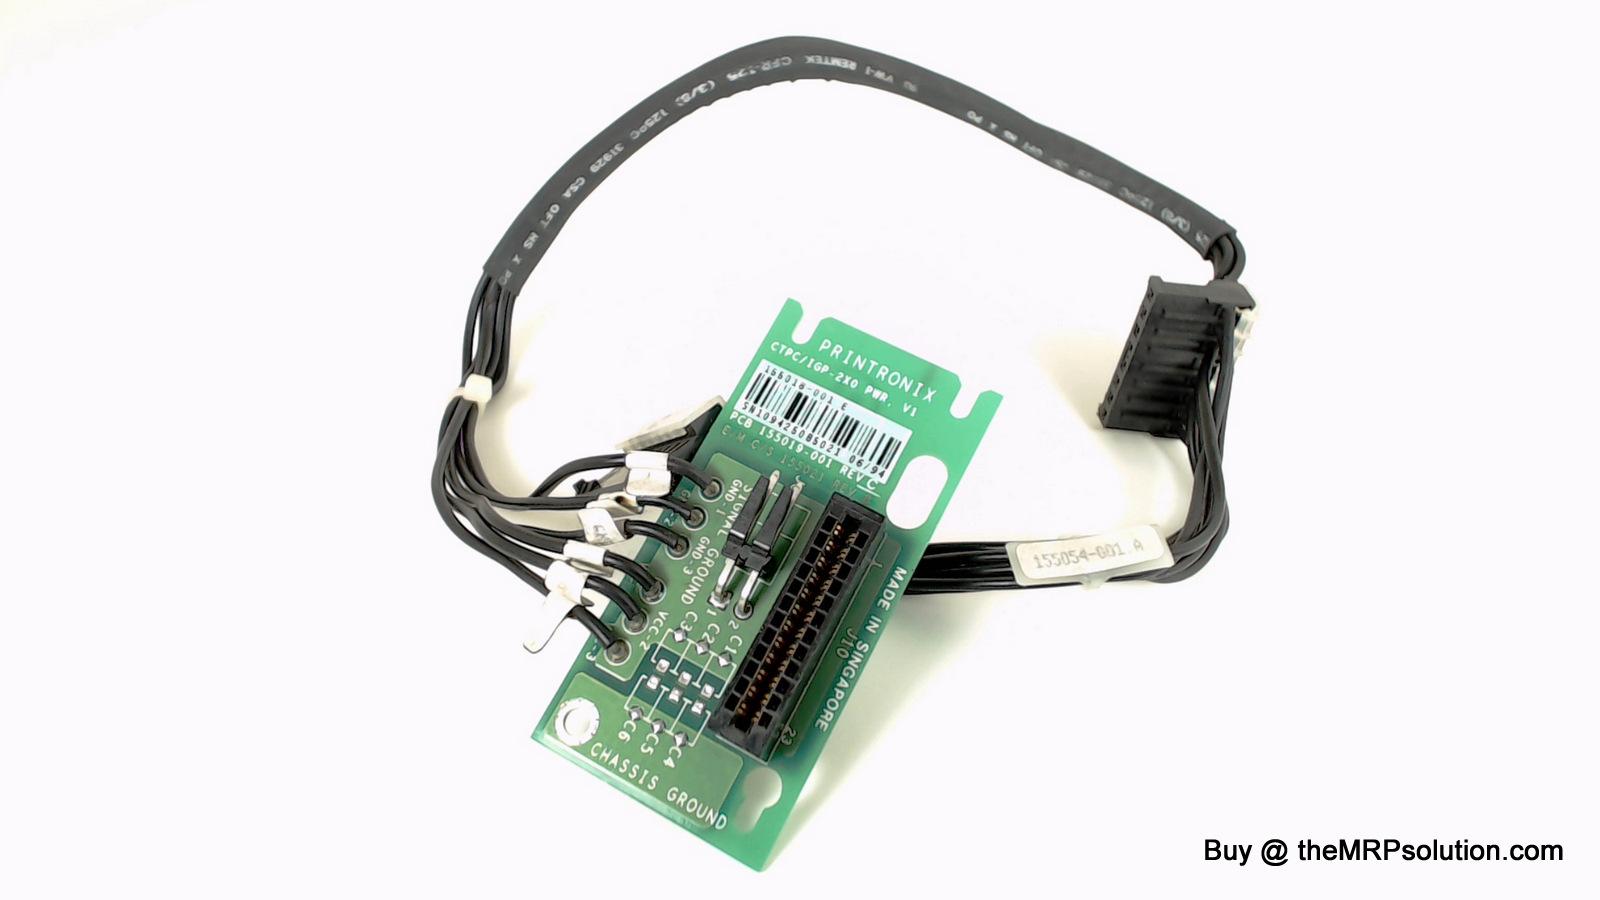 PRINTRONIX 155018-001 PCBA, CTPC/IGP-2X0 PWR, P4280 Refurbished